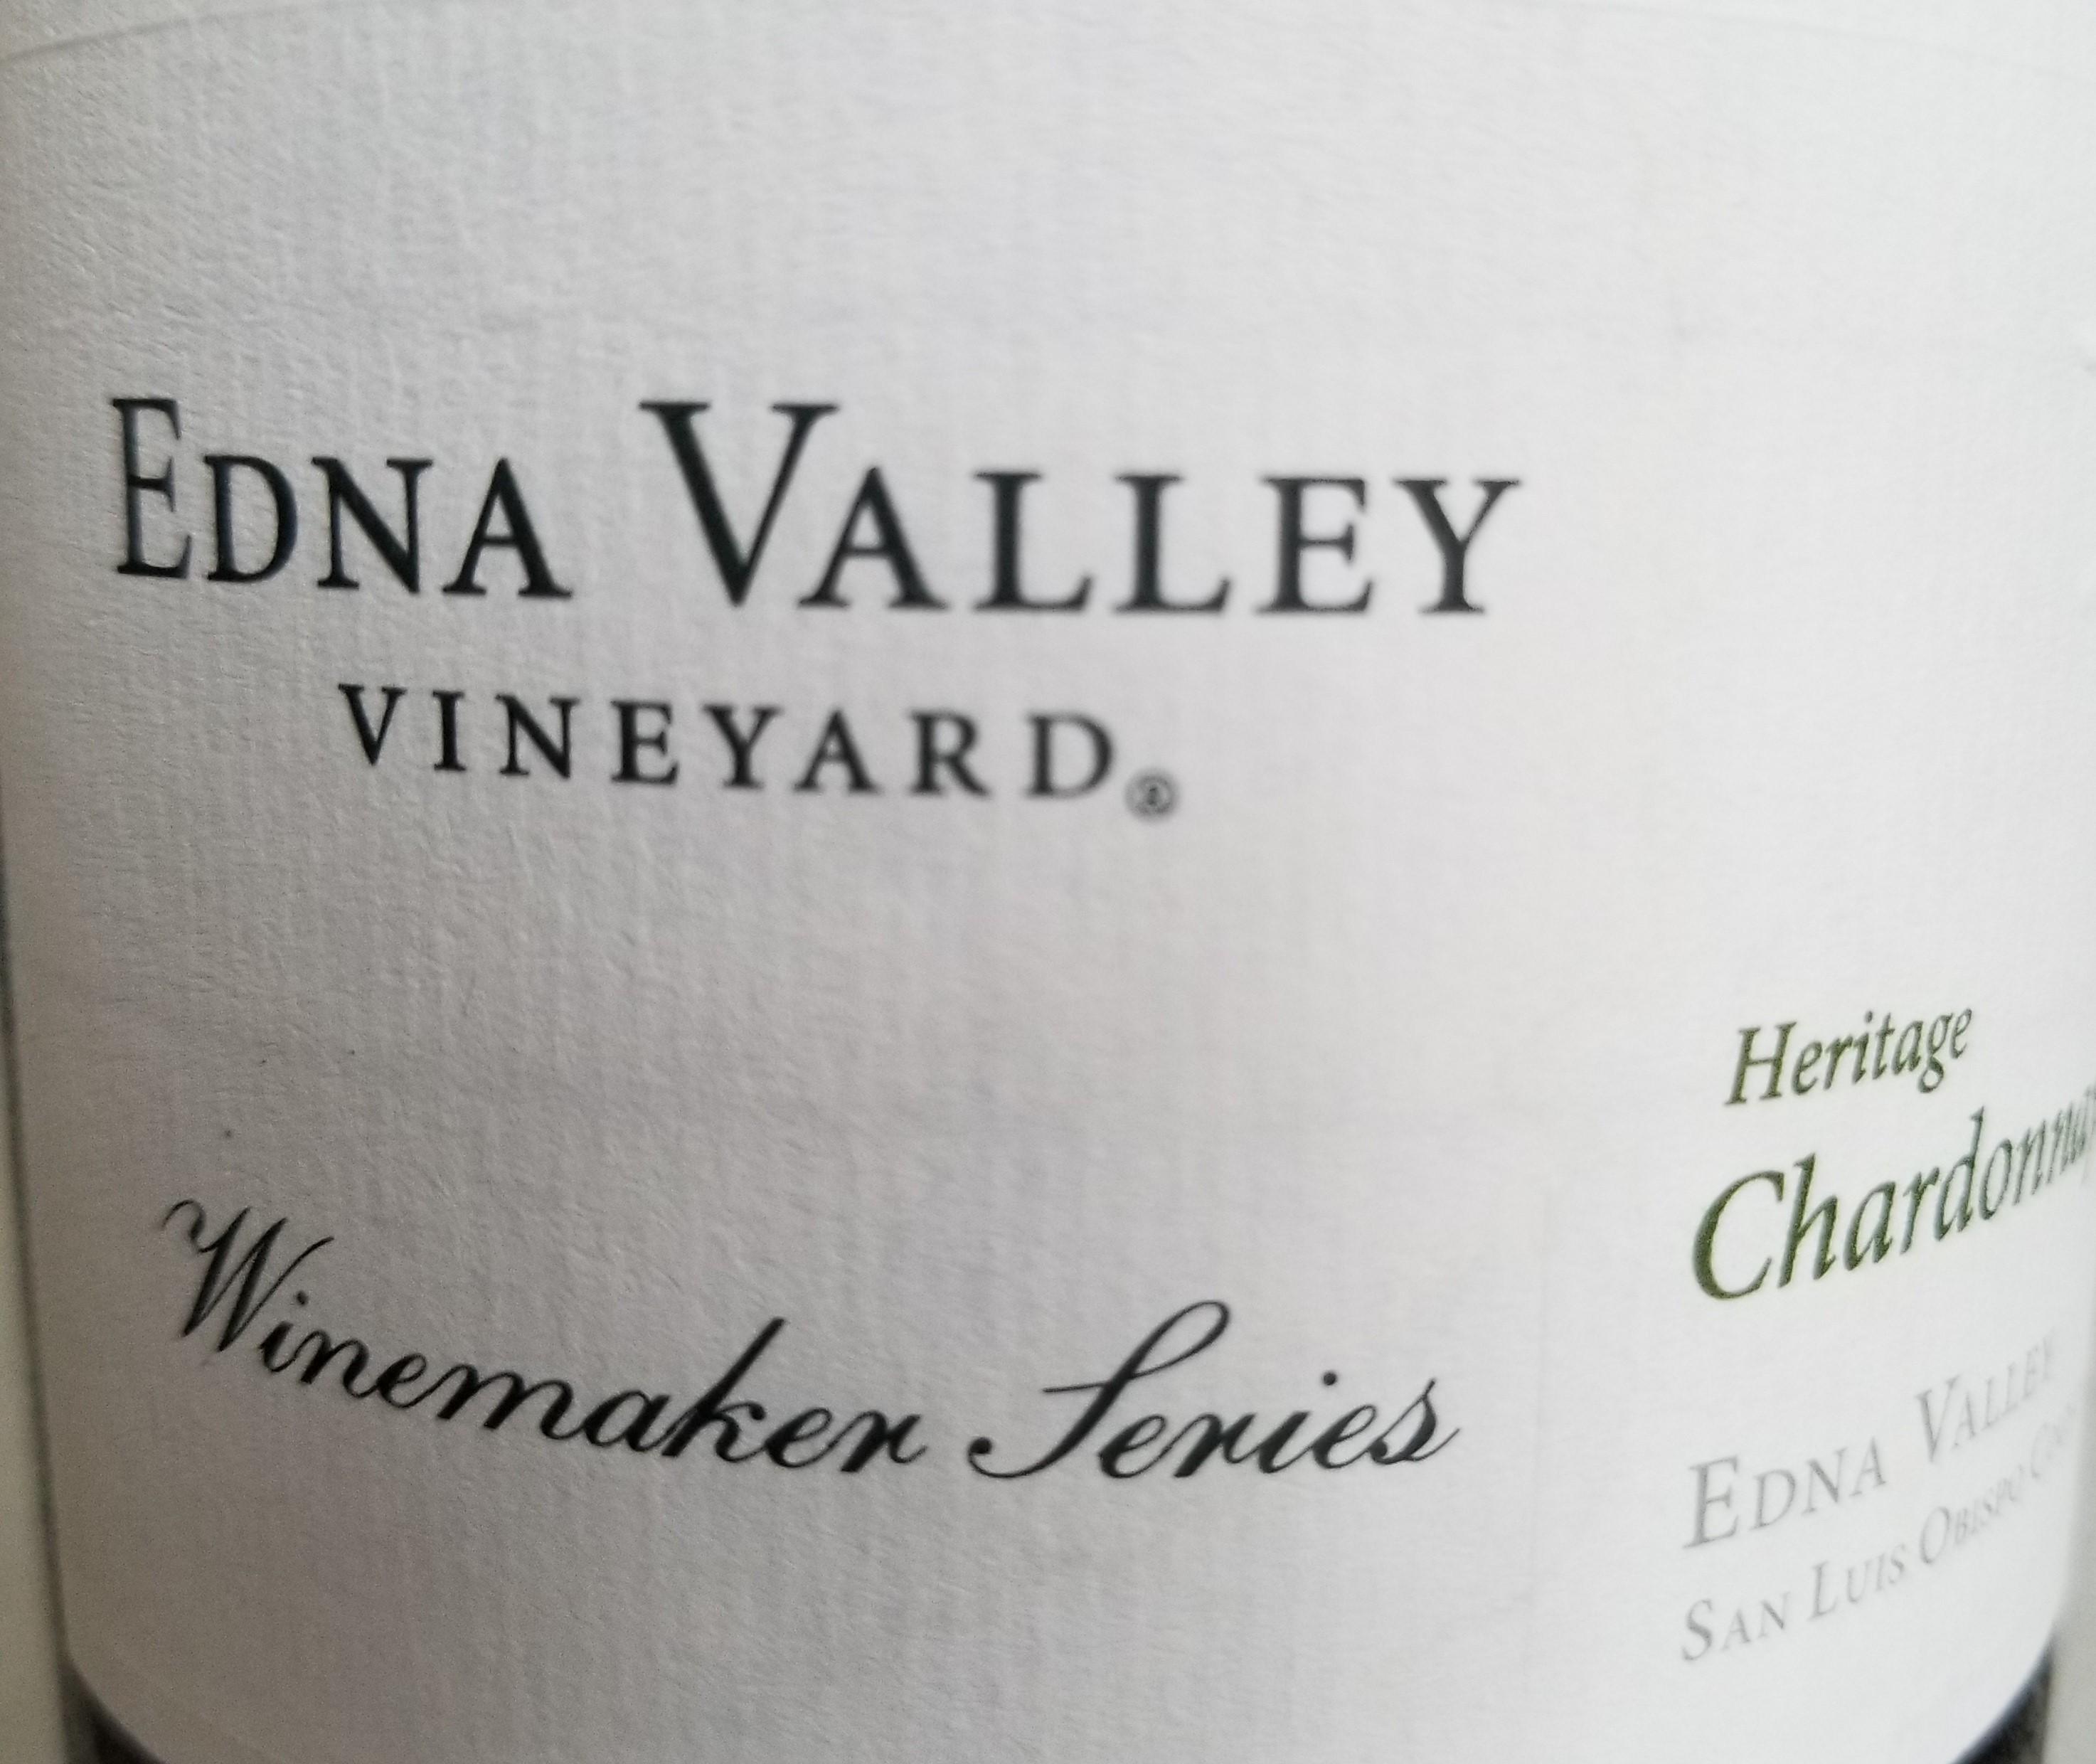 2015 Edna Valley Vineyard Heritage Chardonnay, Winemaker Series photo